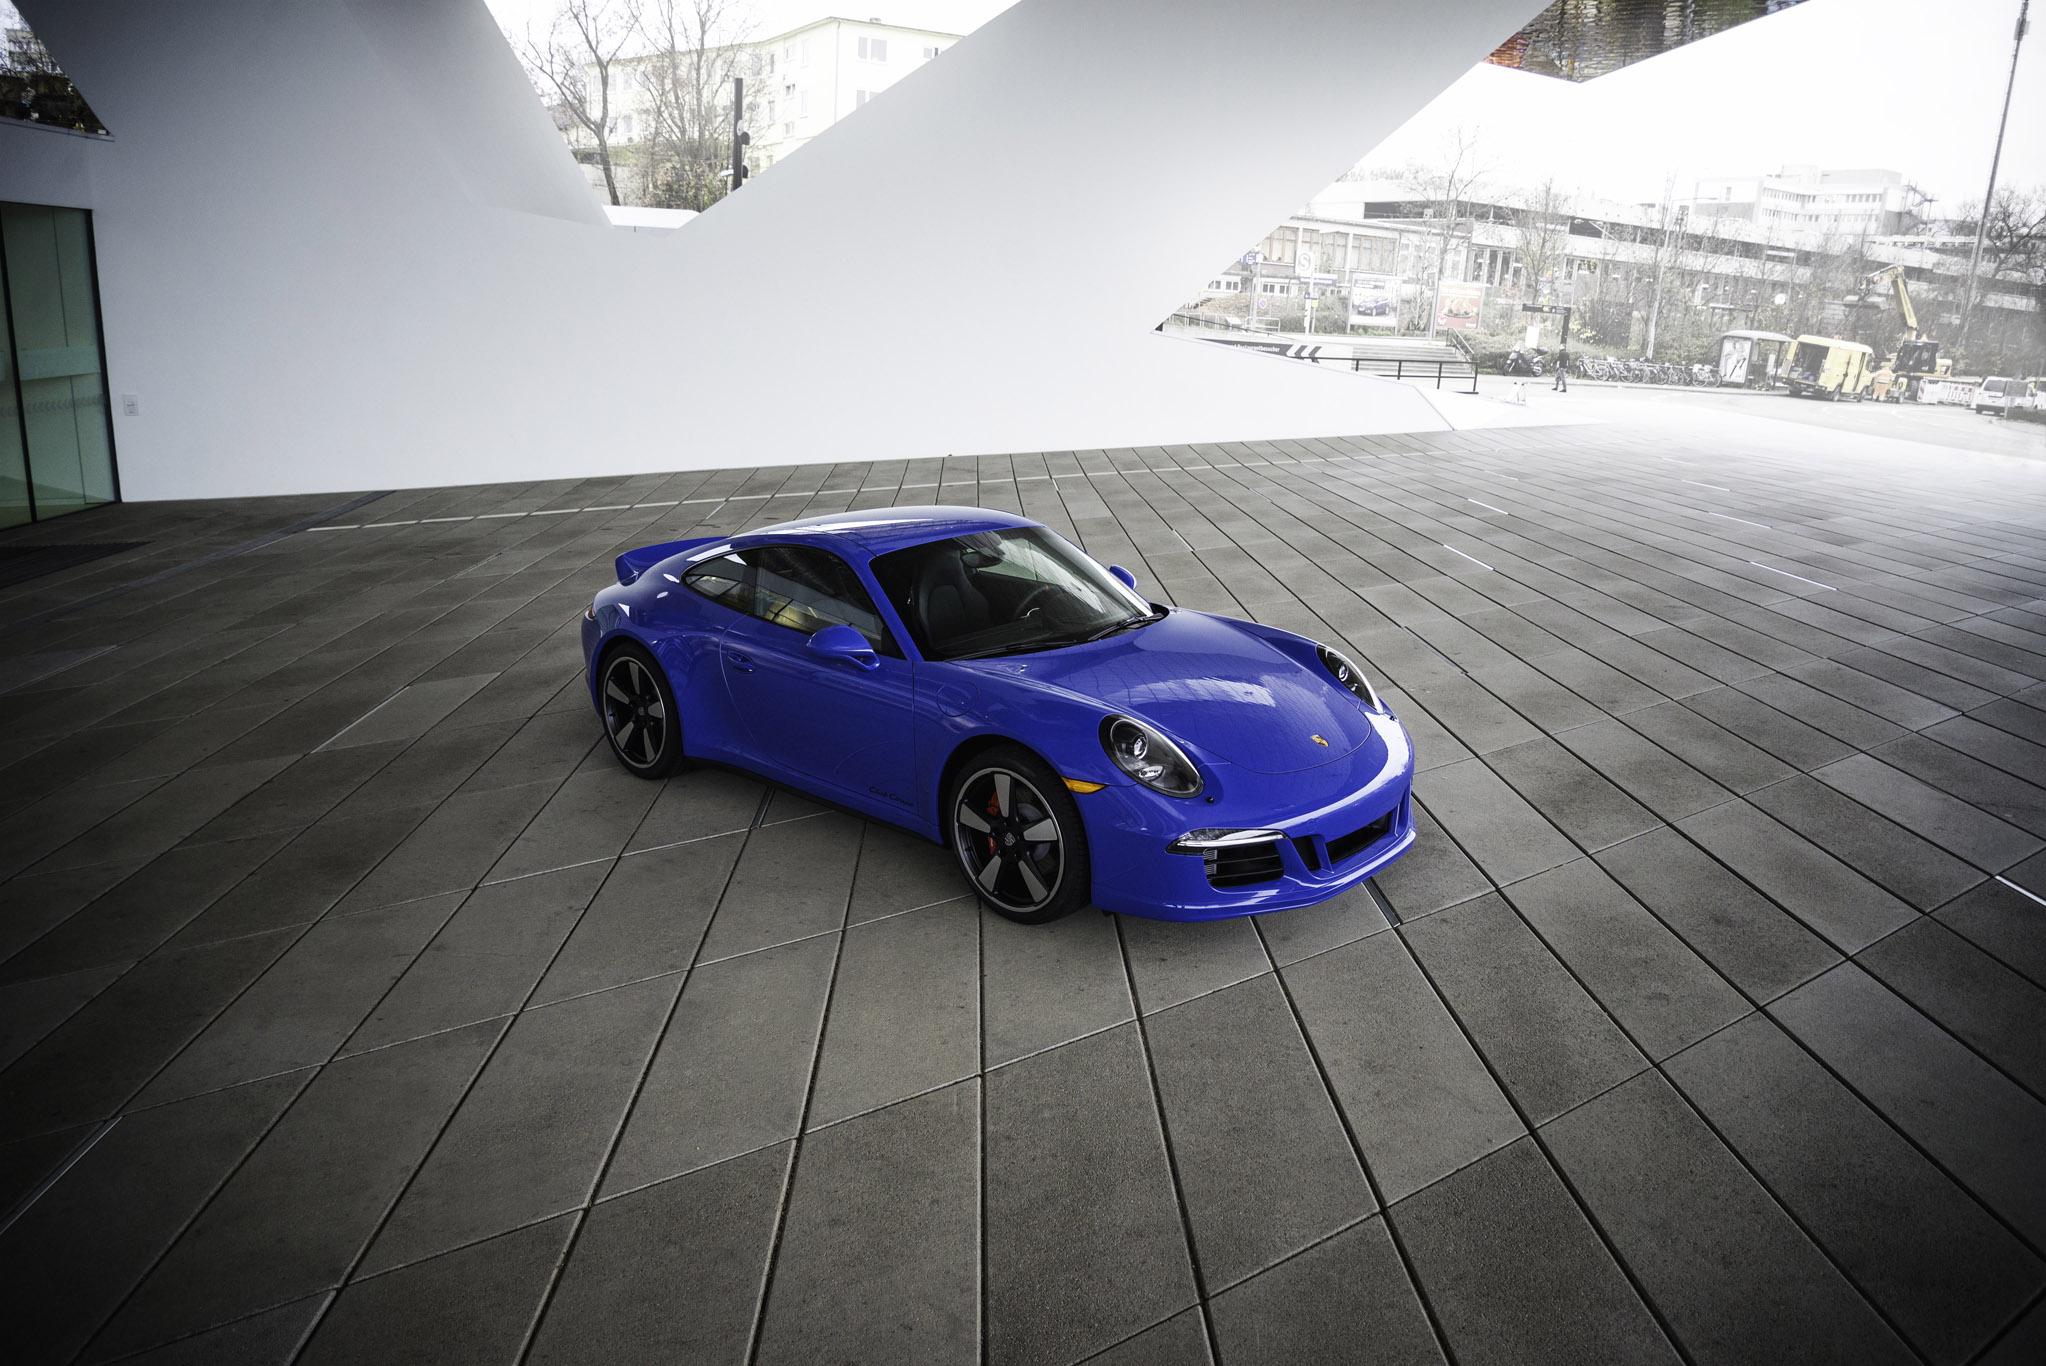 Porsche 911 GTS Club Coupe photo #1